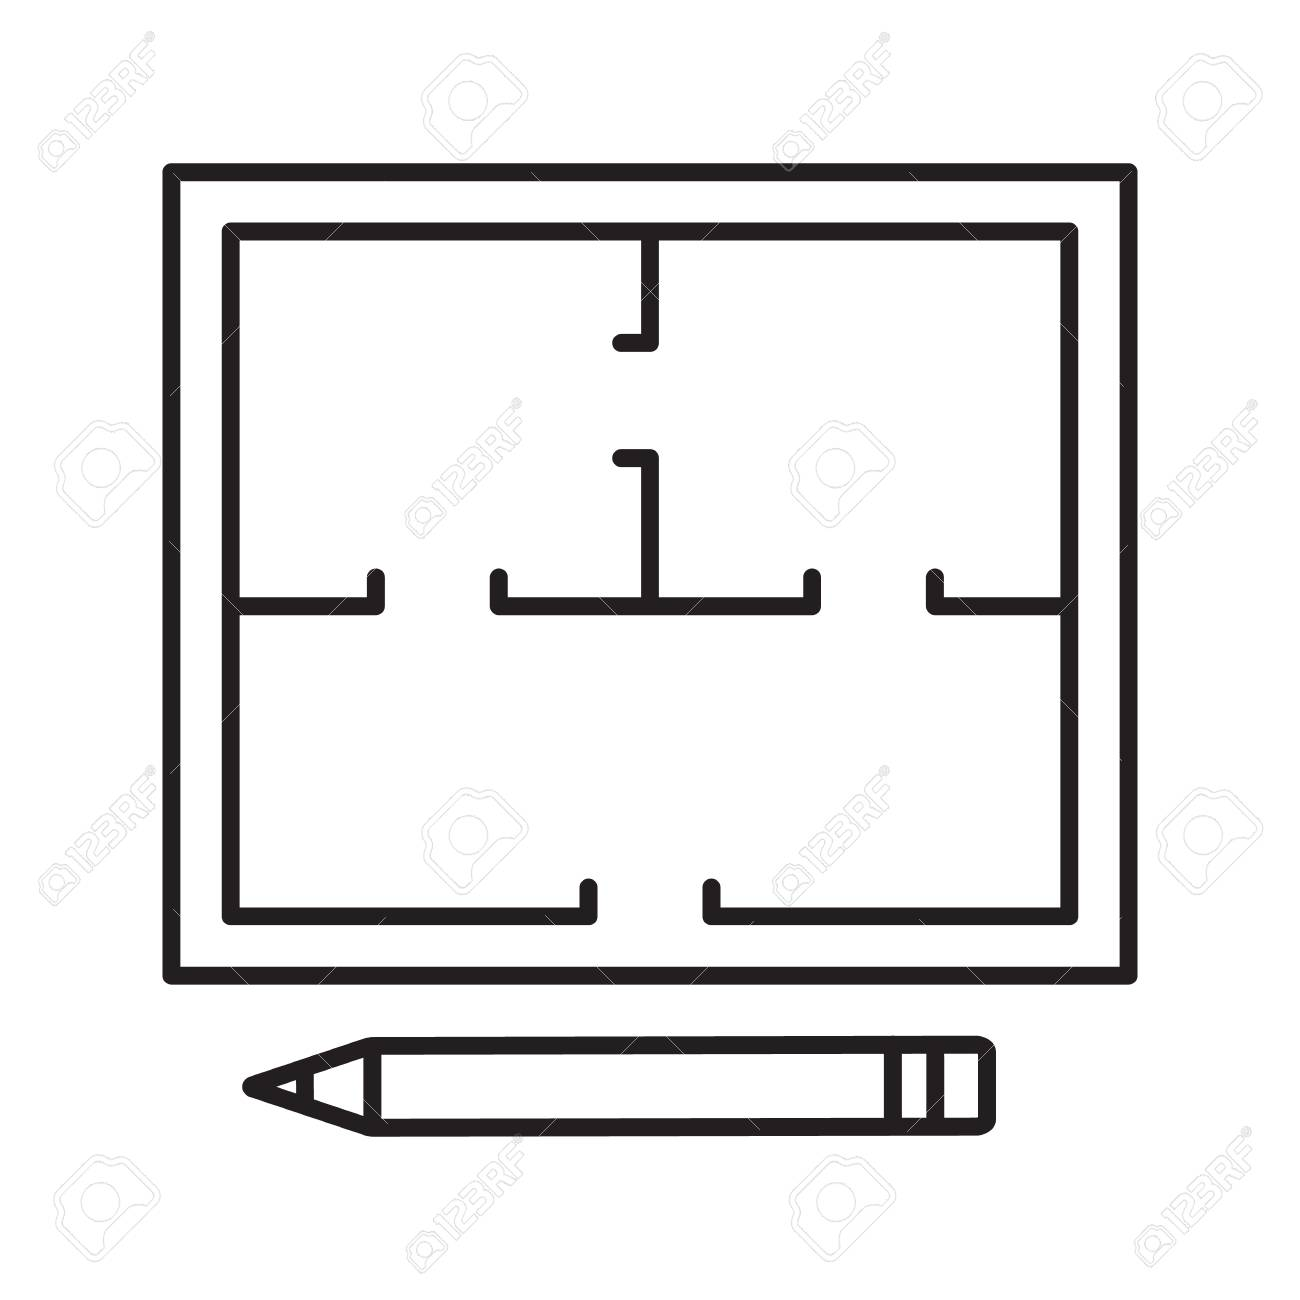 Floor plan linear icon. Thin line illustration. Flat blueprint.